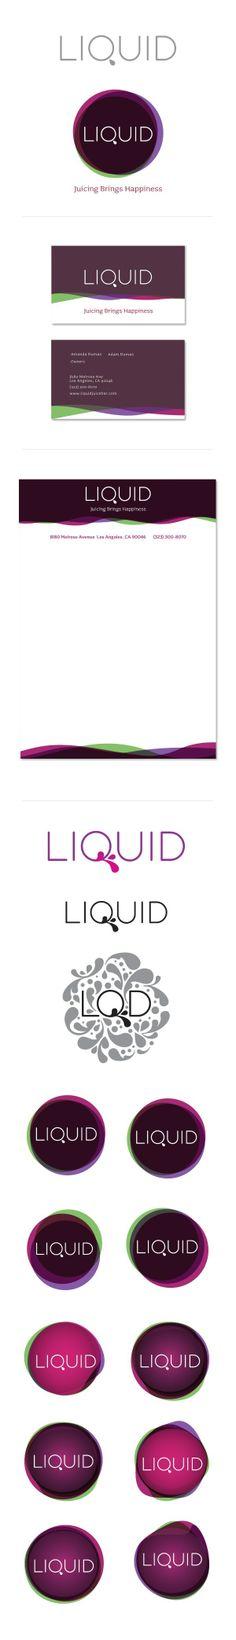 Liquid Juice Bar by Jenny Ambrose, via Behance